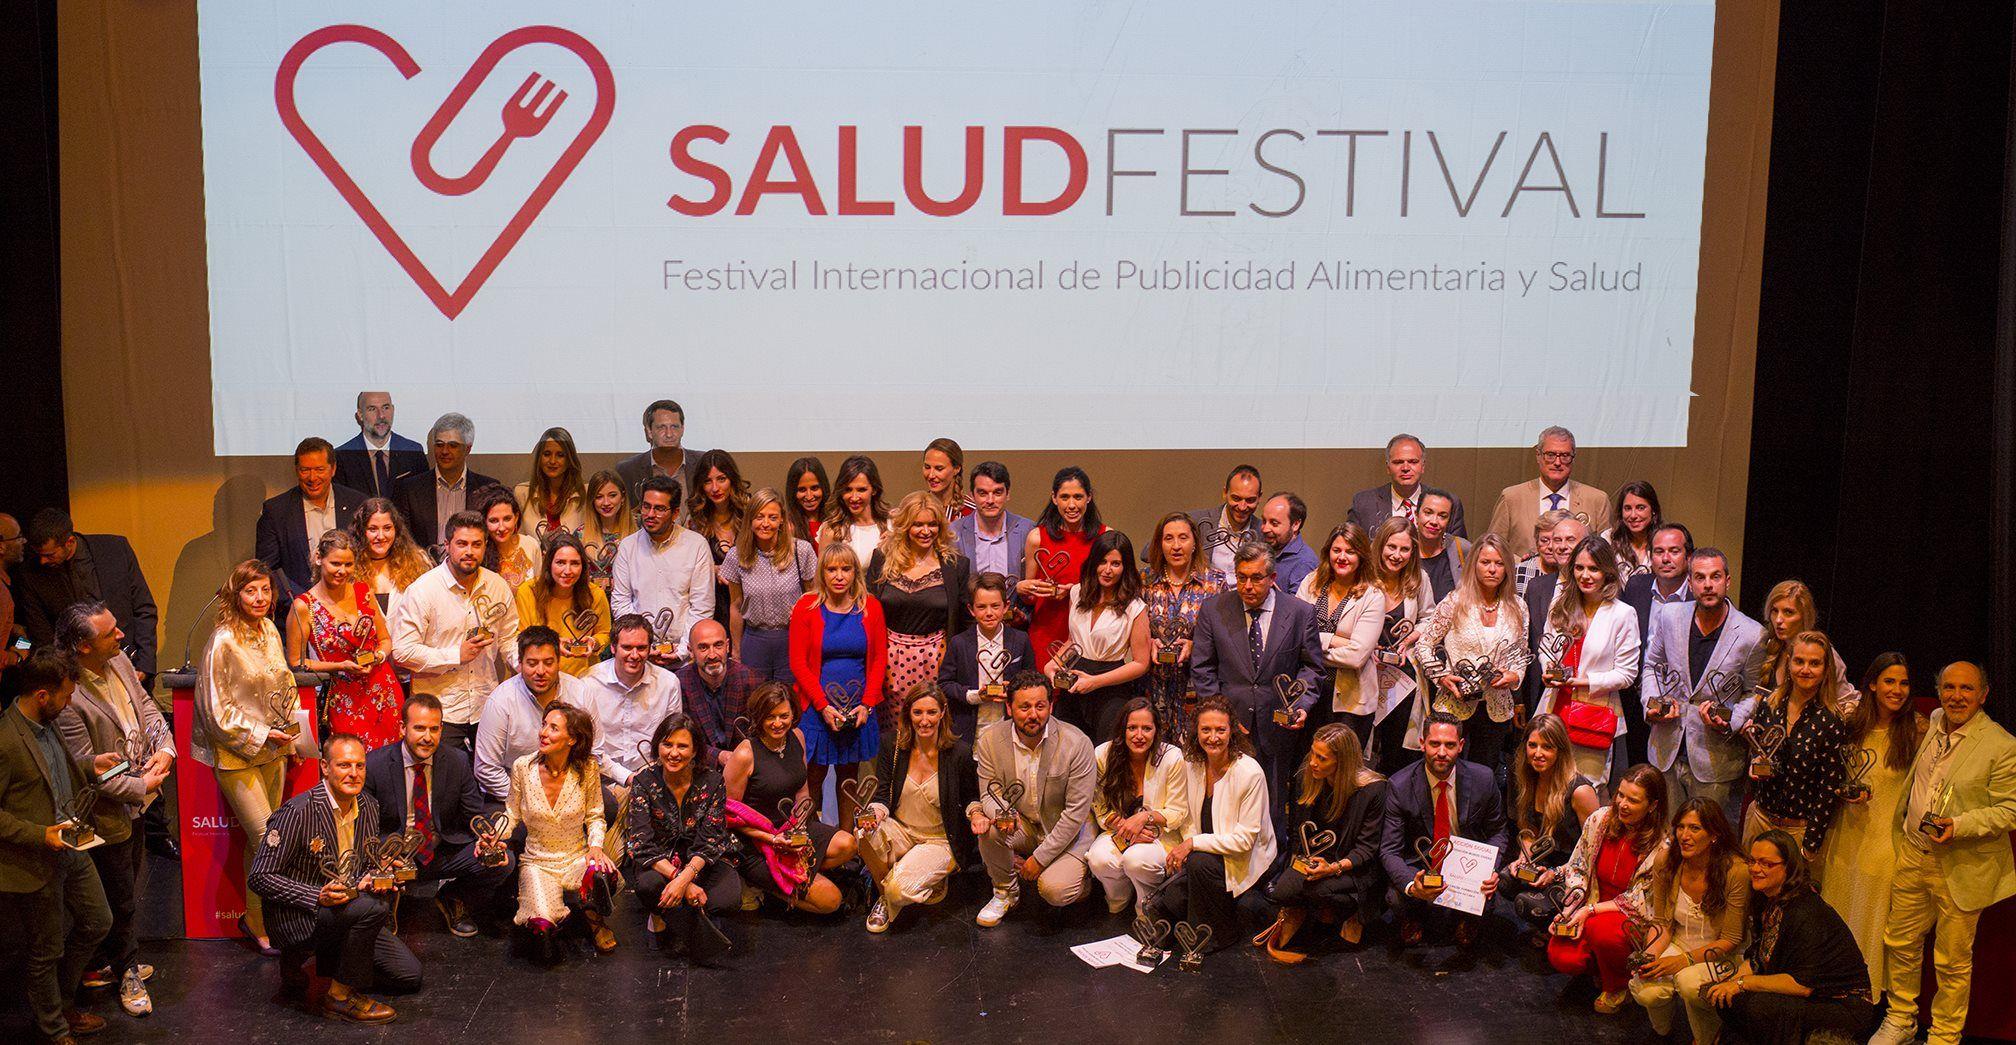 Salud festival en Málaga